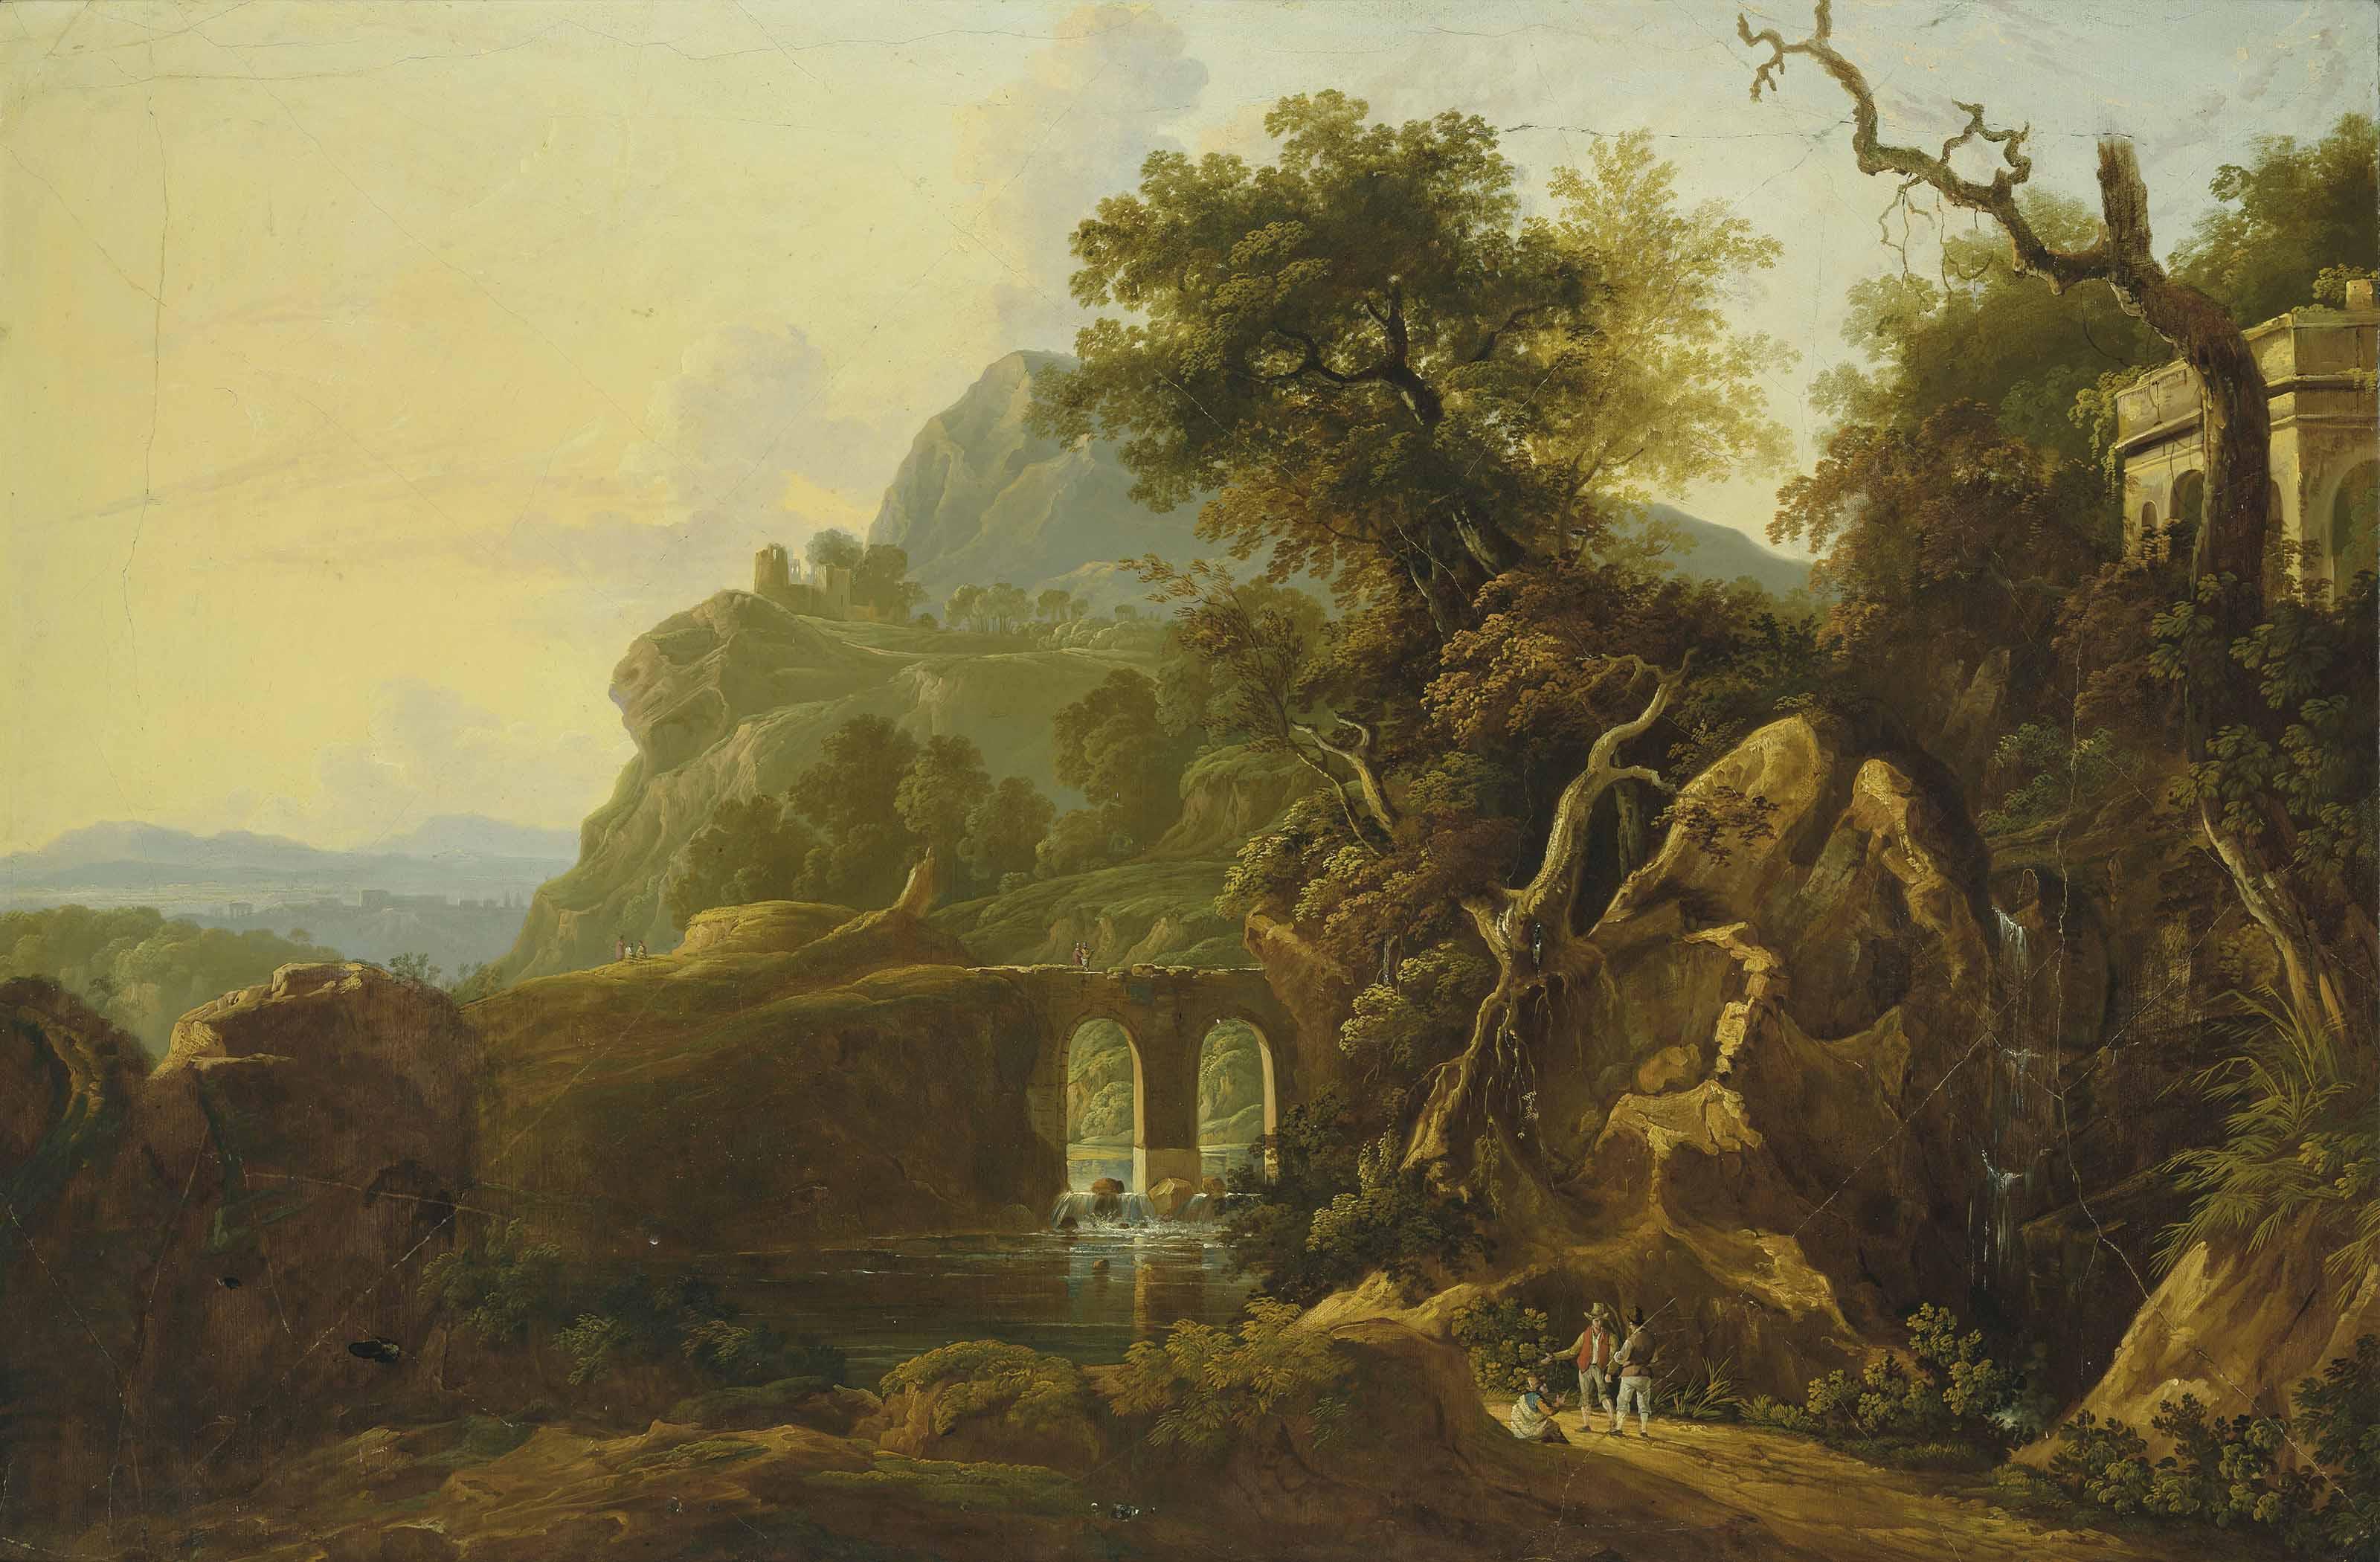 A mountainous river landscape with figures